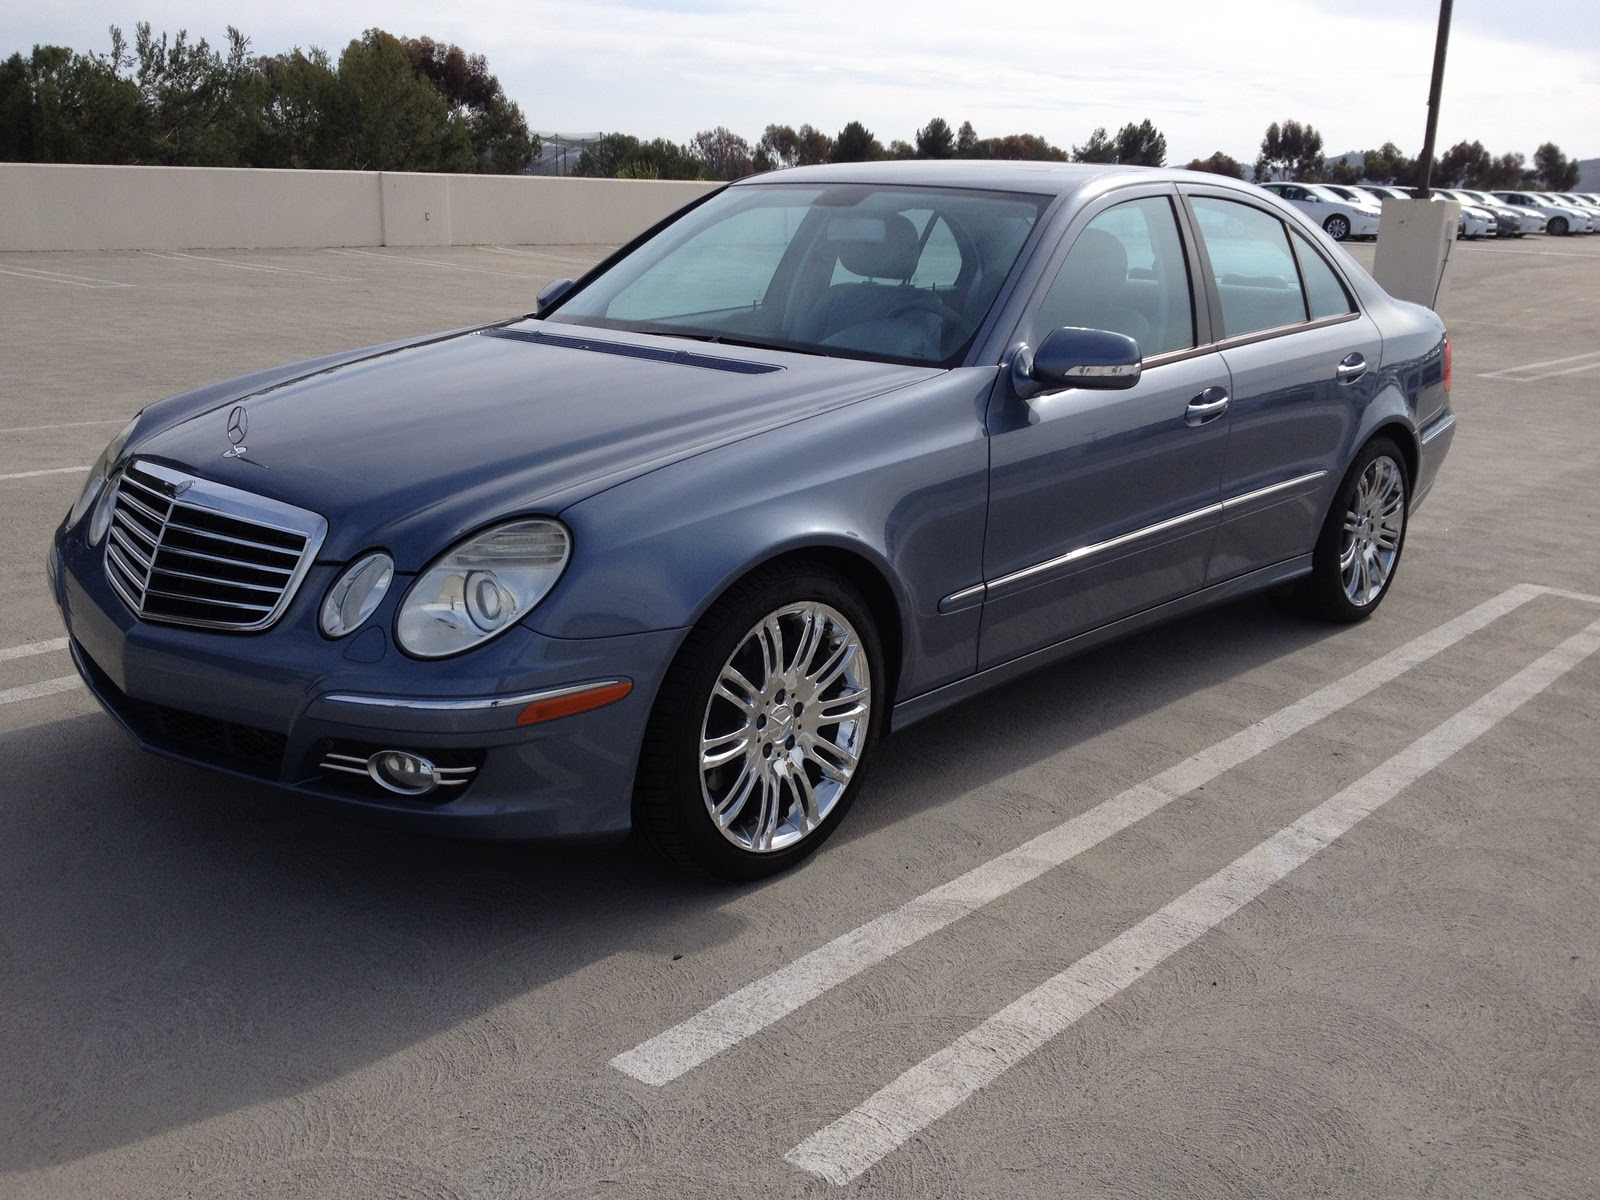 2007 Mercedes-Benz E-Class - Pictures - CarGurus